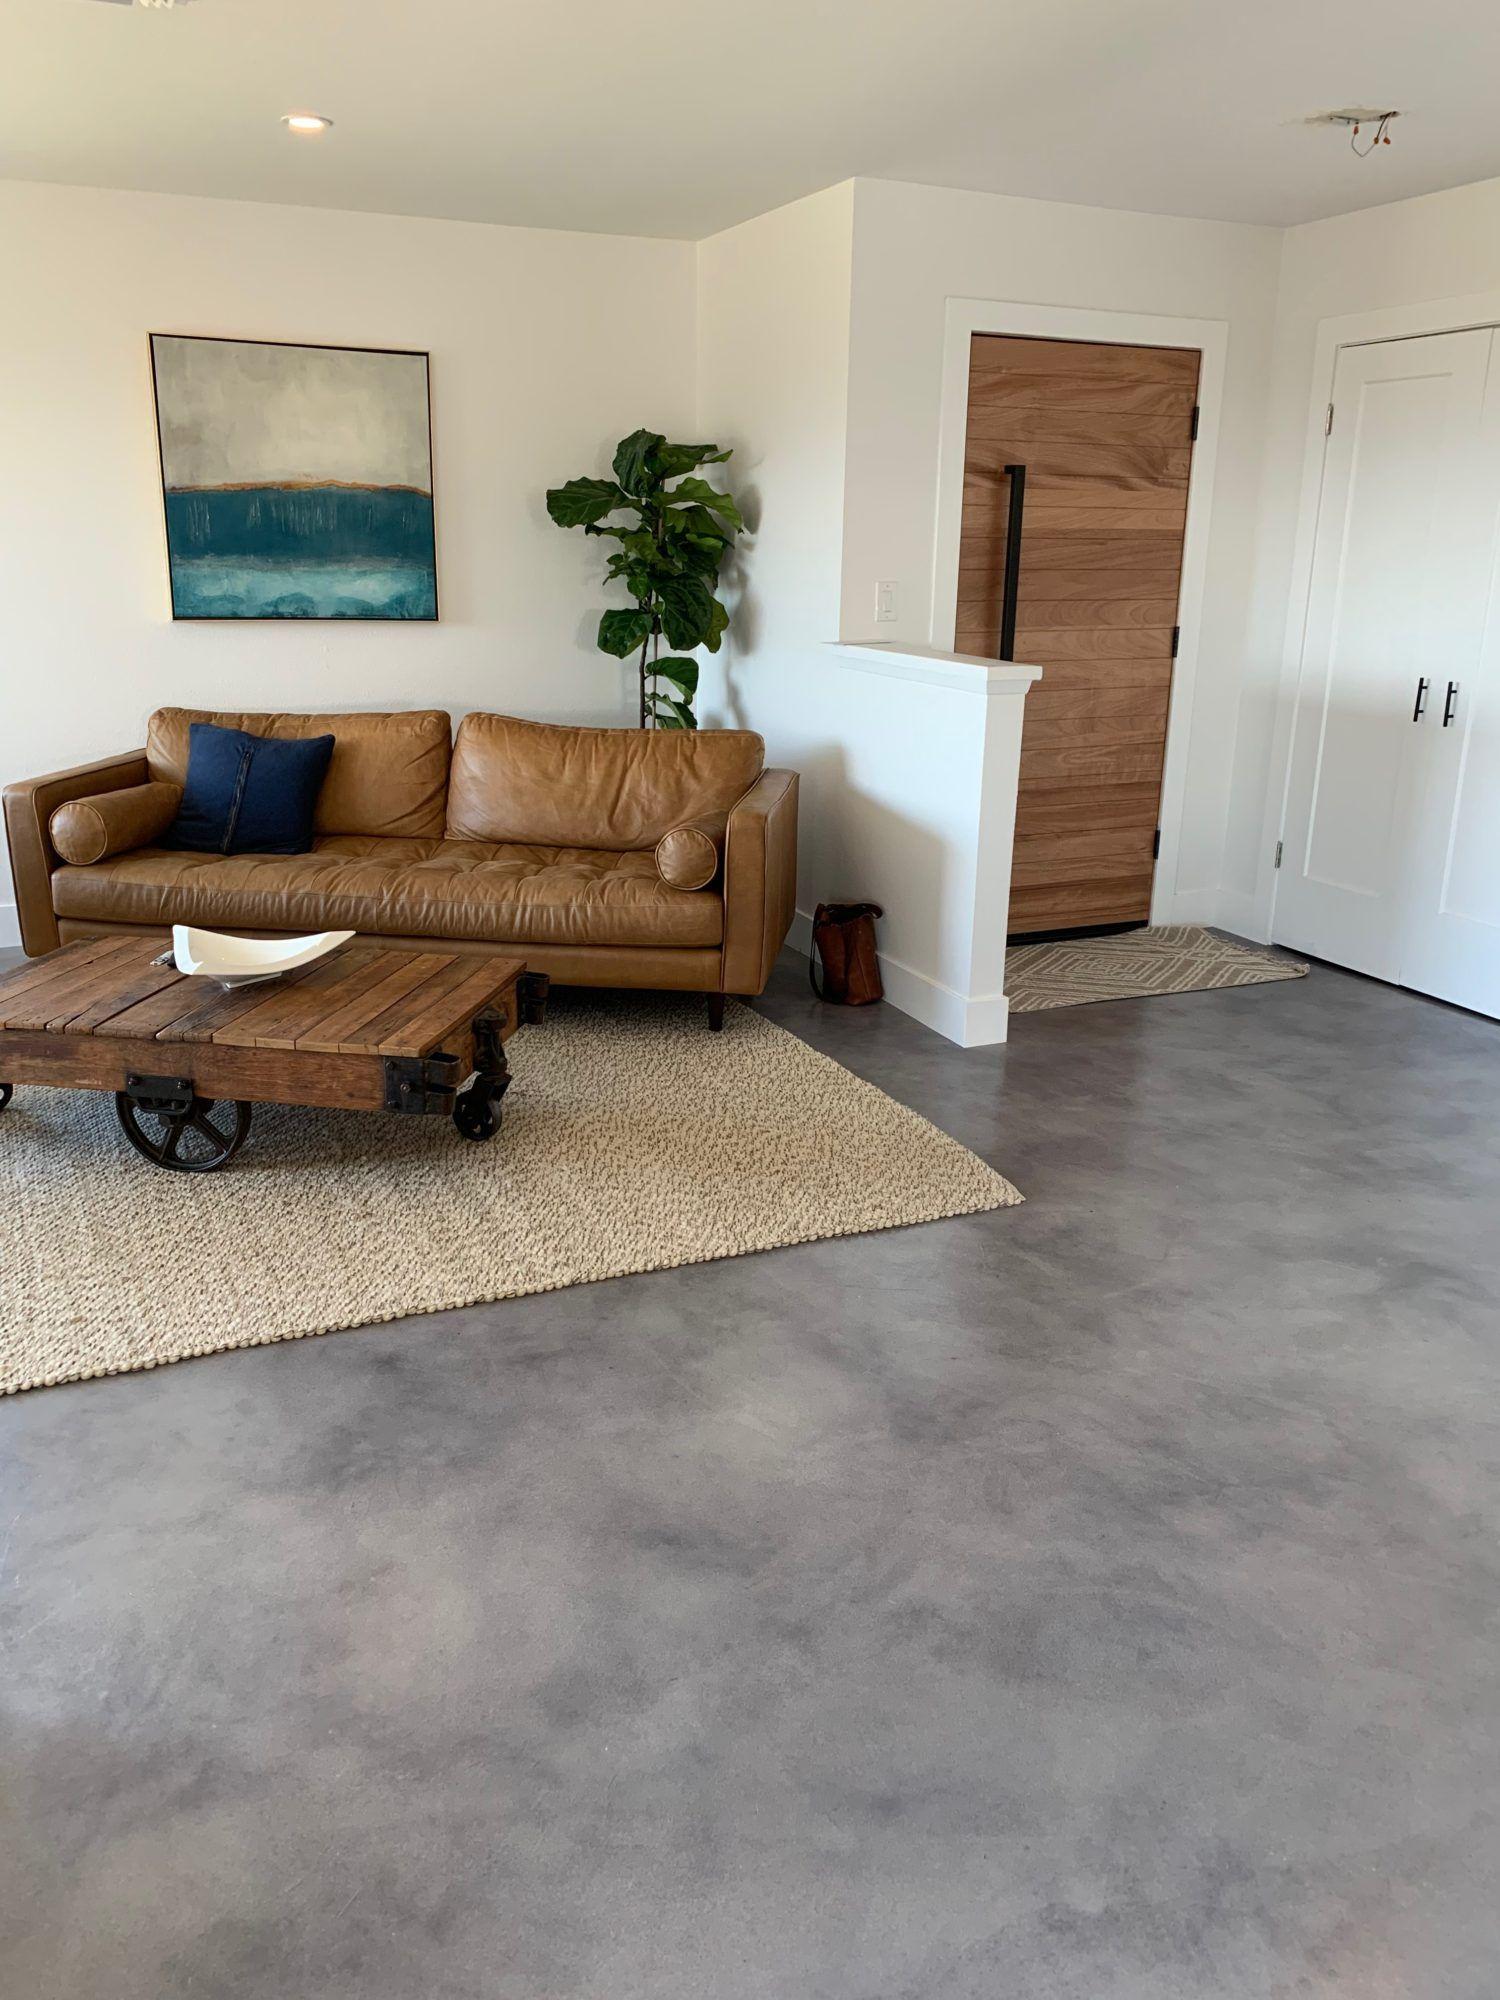 15 Ideal Basement Floor Paint Ideas And Flooring Options Chd Ideas In 2020 Concrete Floors Living Room Concrete Stained Floors Floor Paint Colors